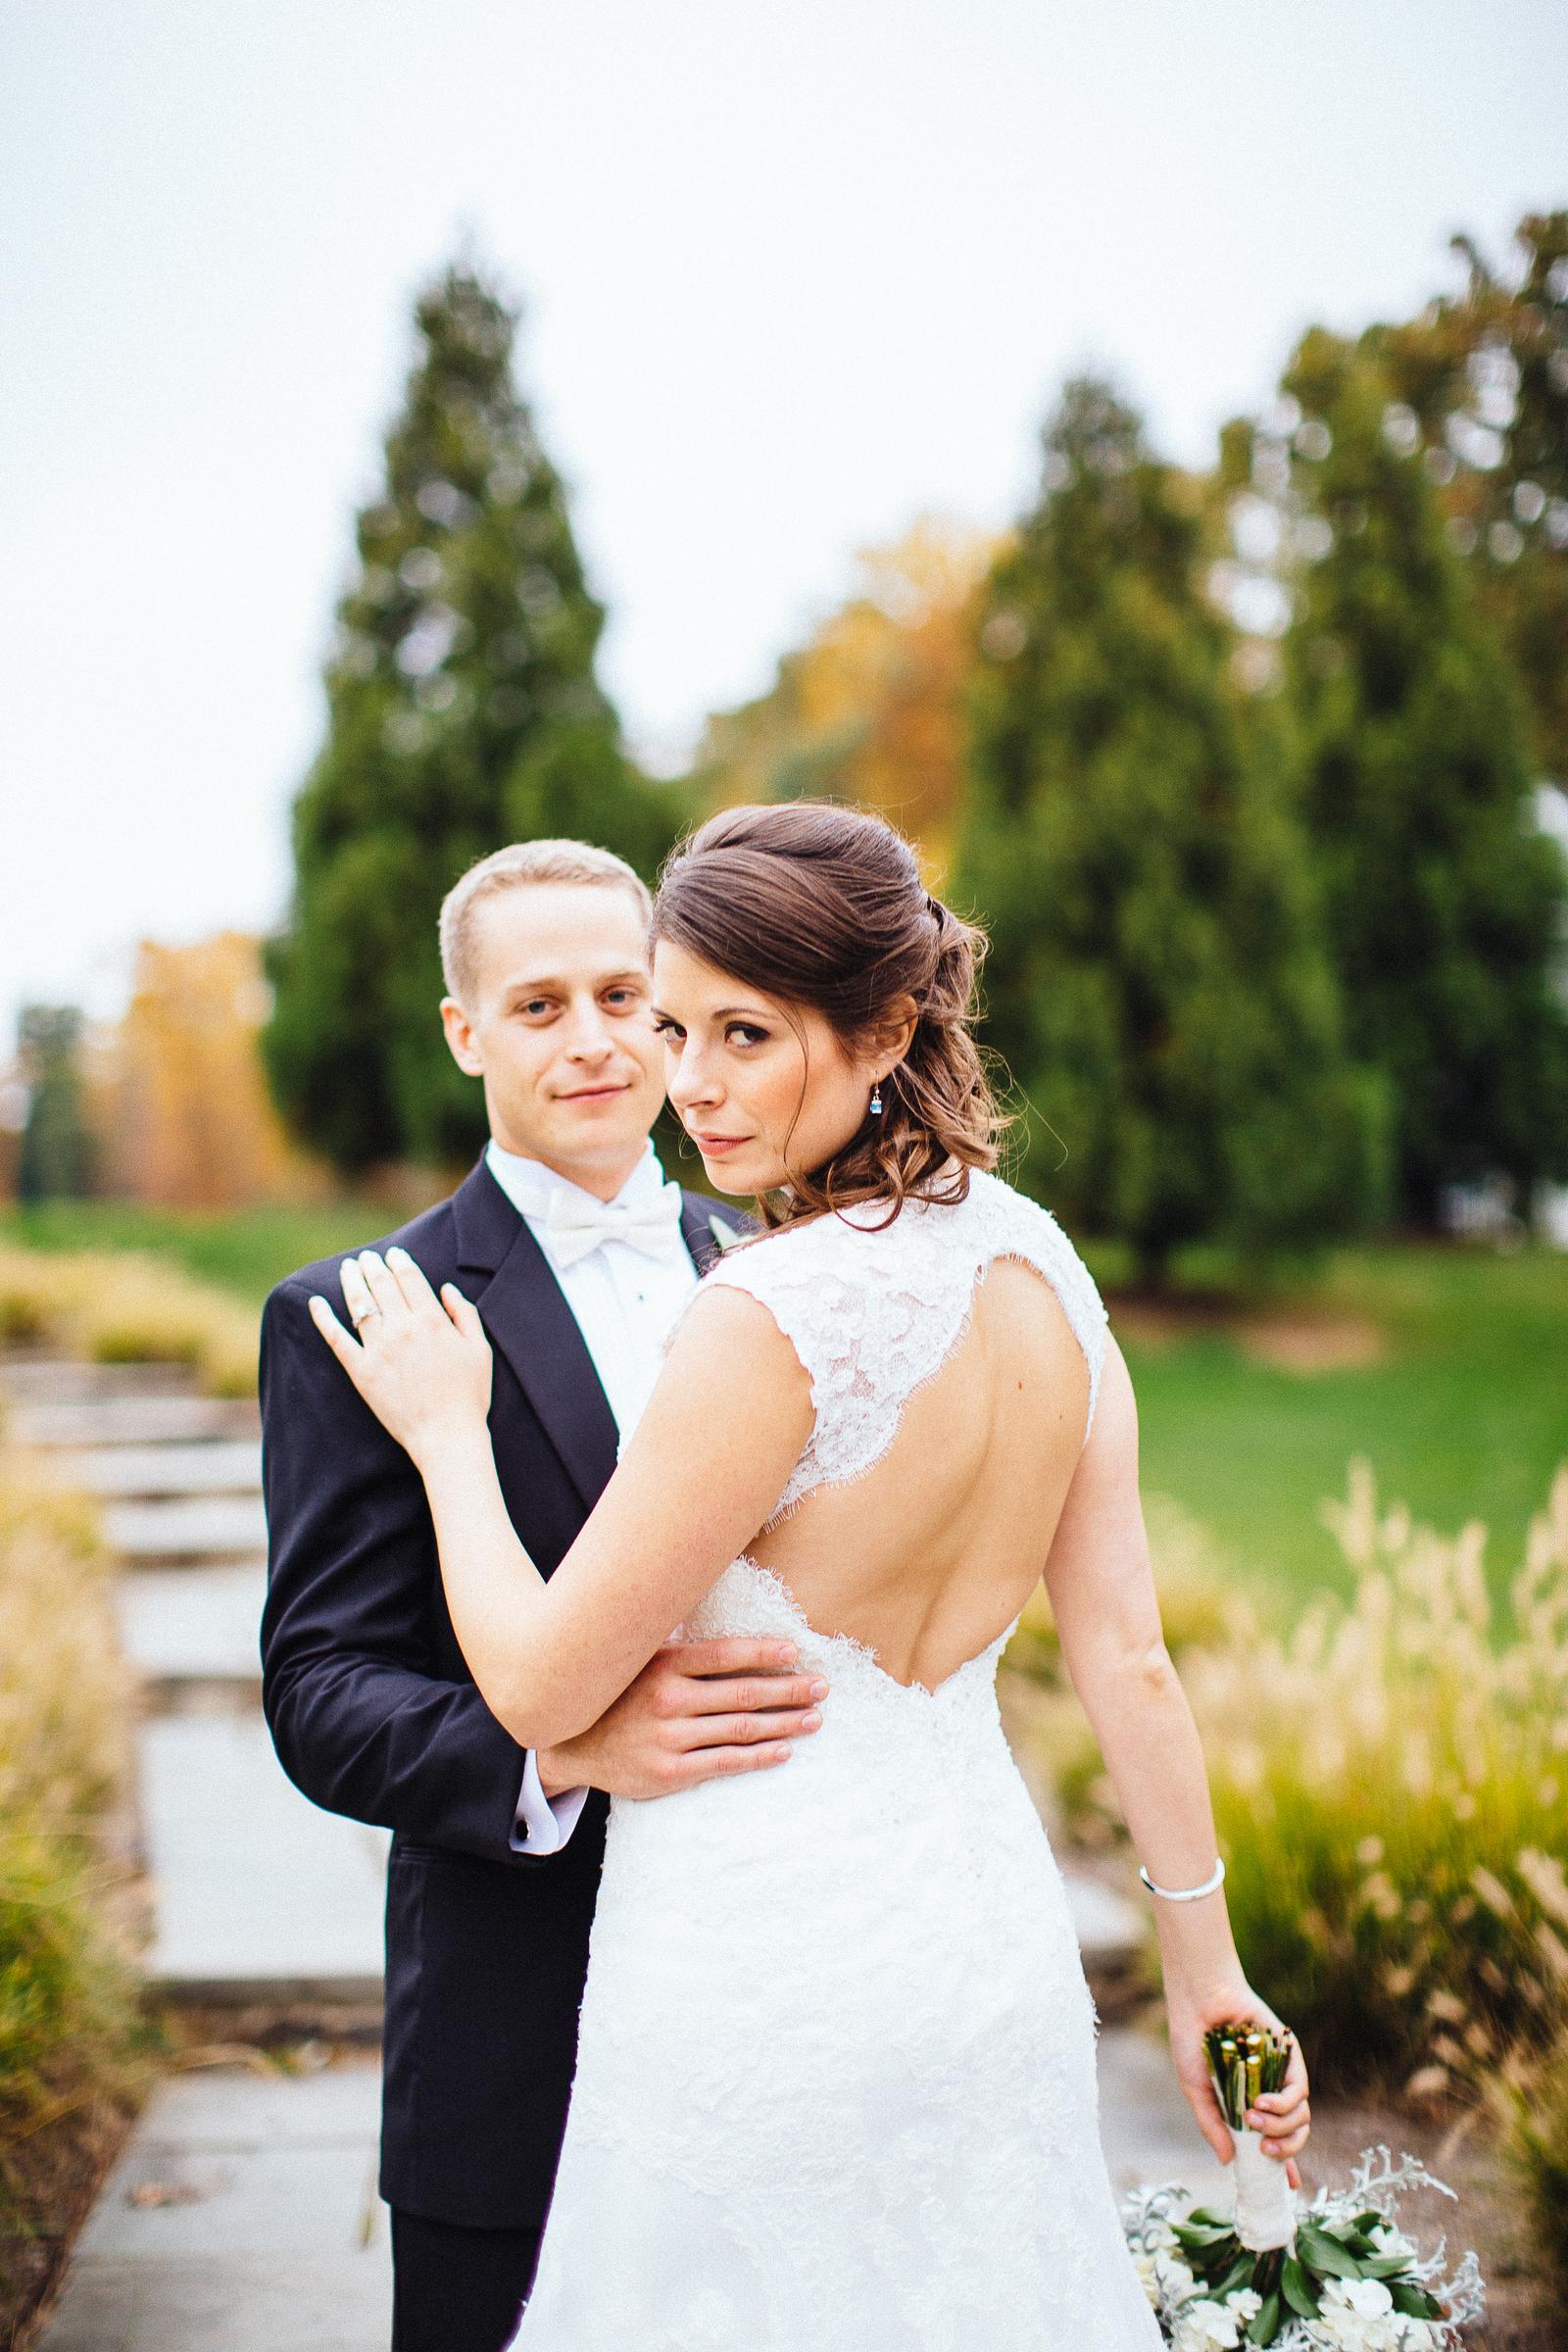 Caroline + Jacob on October 19, 2013 ♥ Sam Dean Photography at Westfields Golf Club (Clifton, VA)